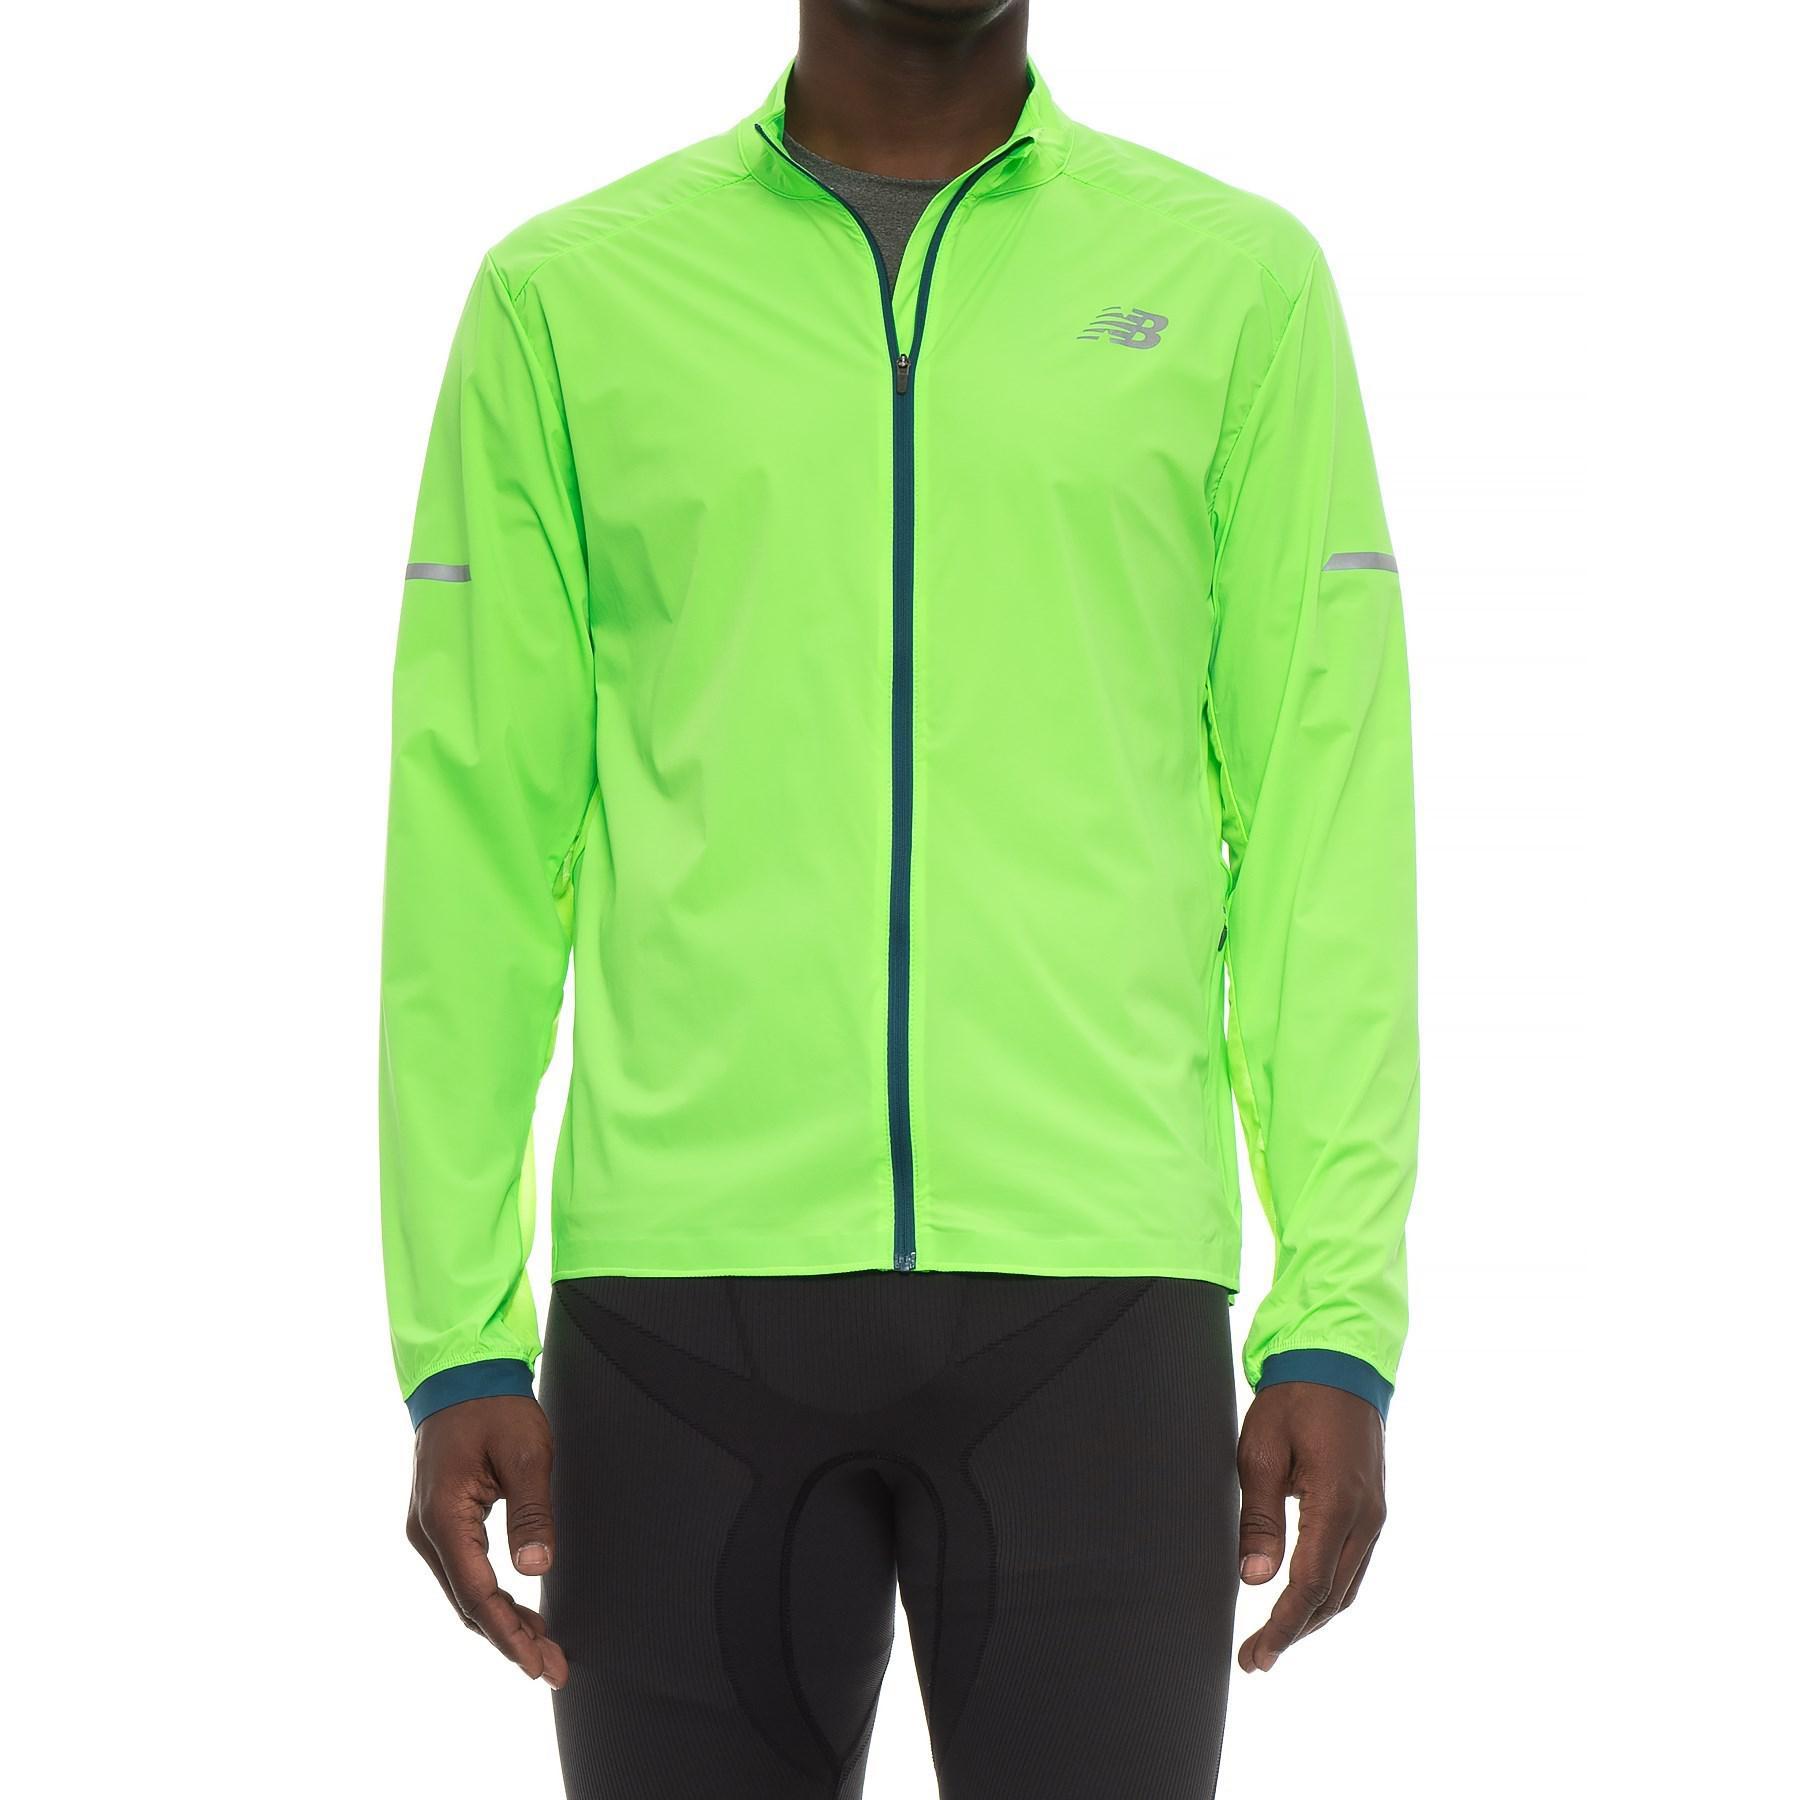 Lyst New Balance Speed Running Jacket For Men In Green For Men